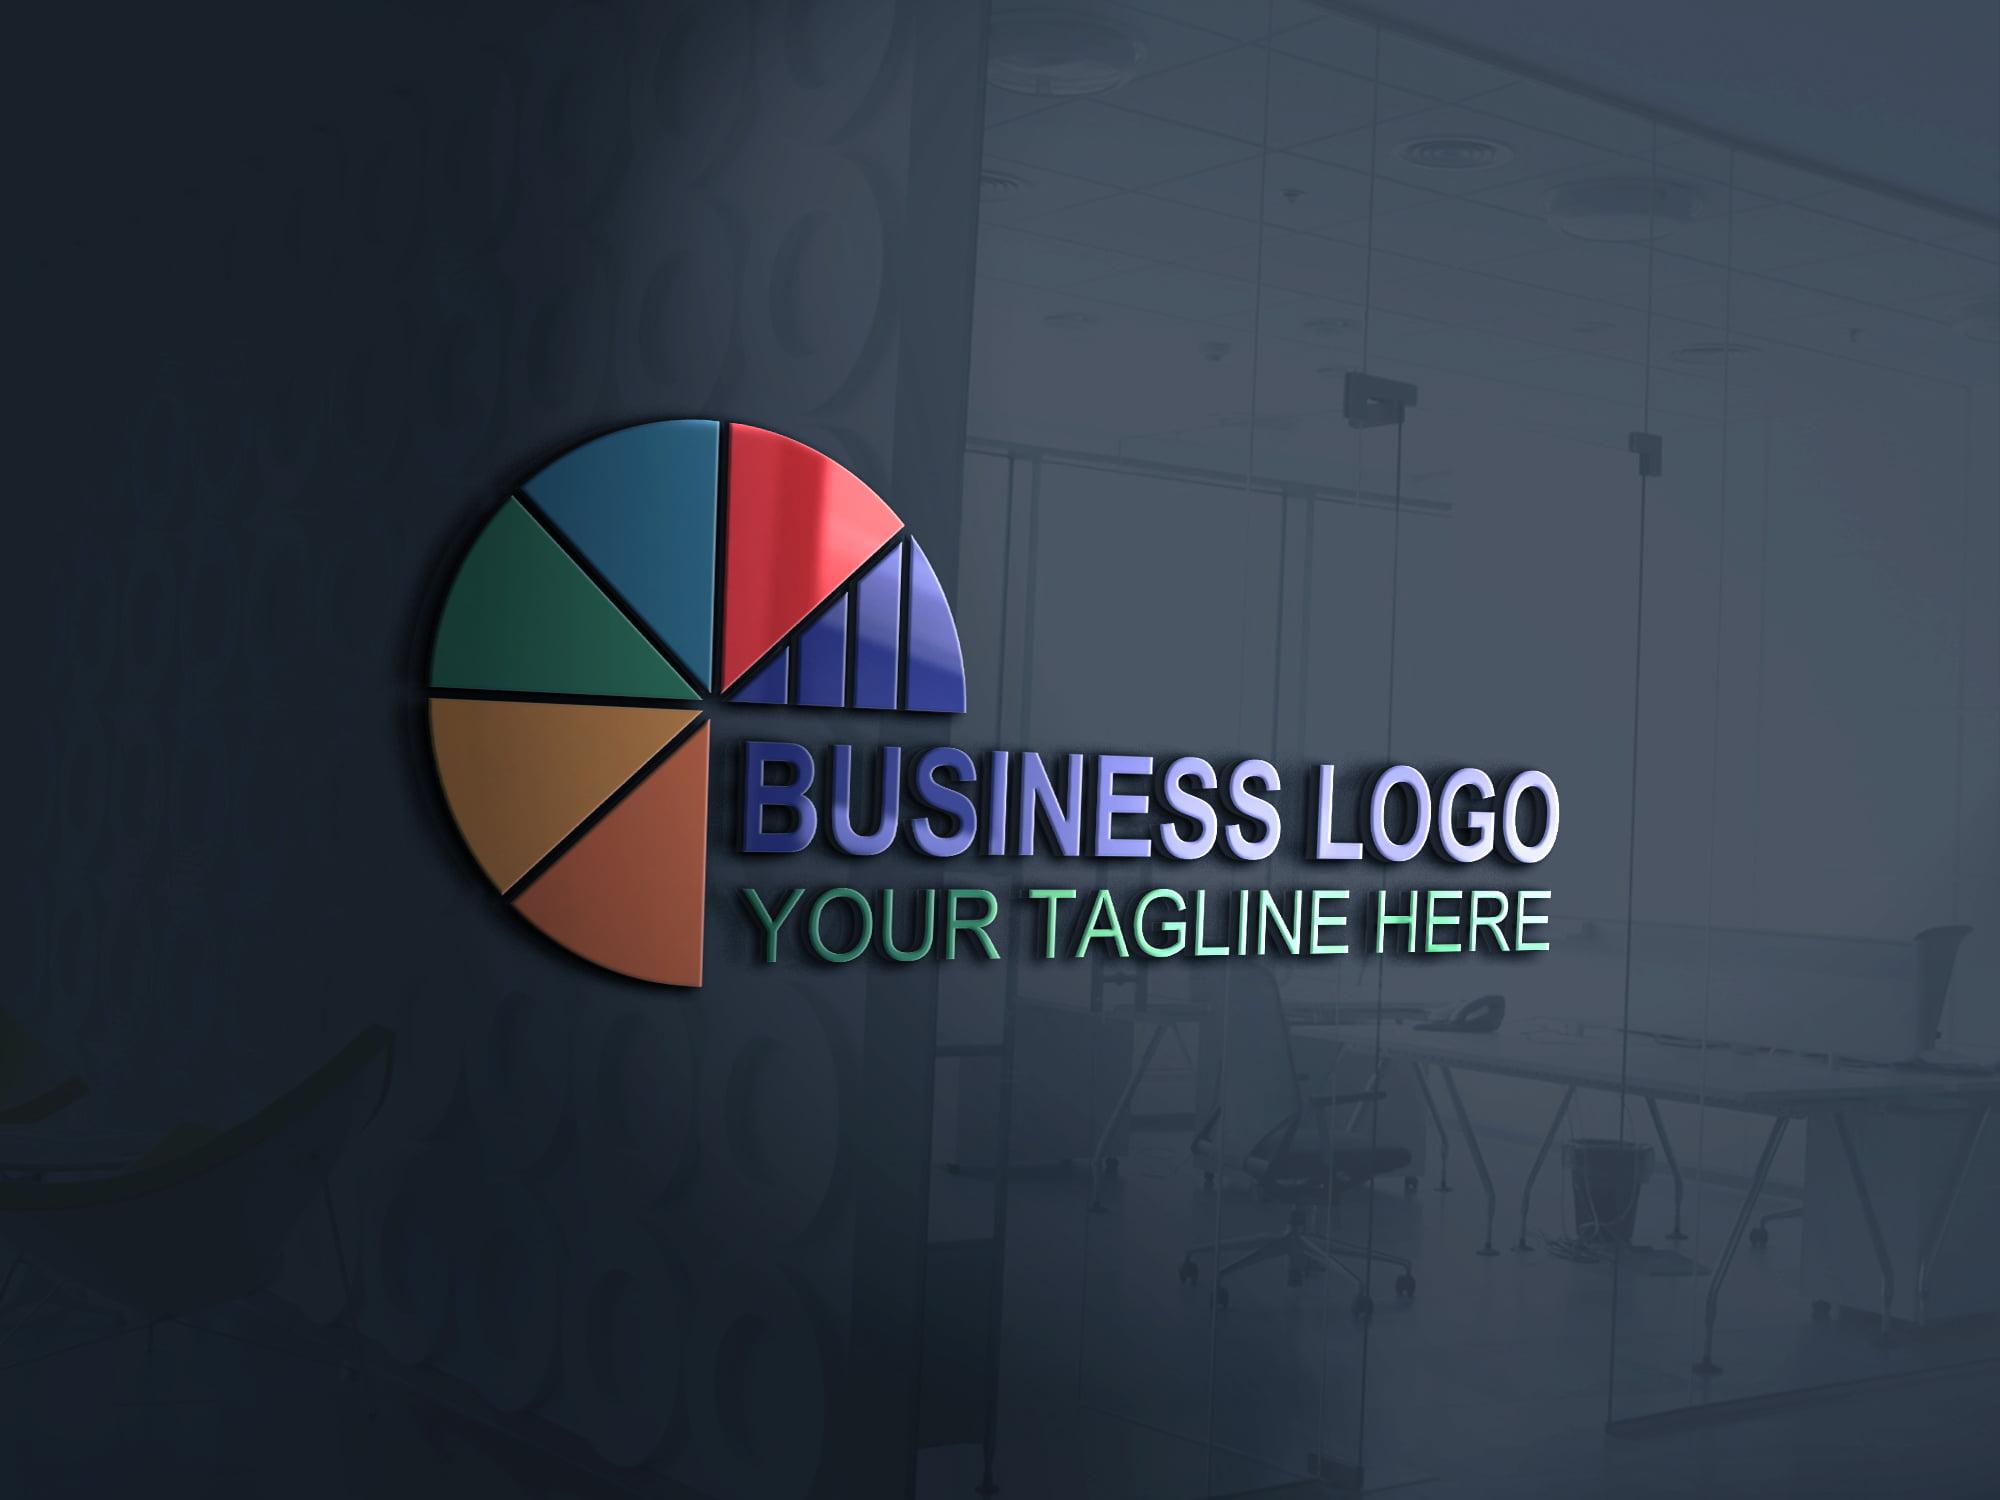 Business marketing logo design template on 3d glass window